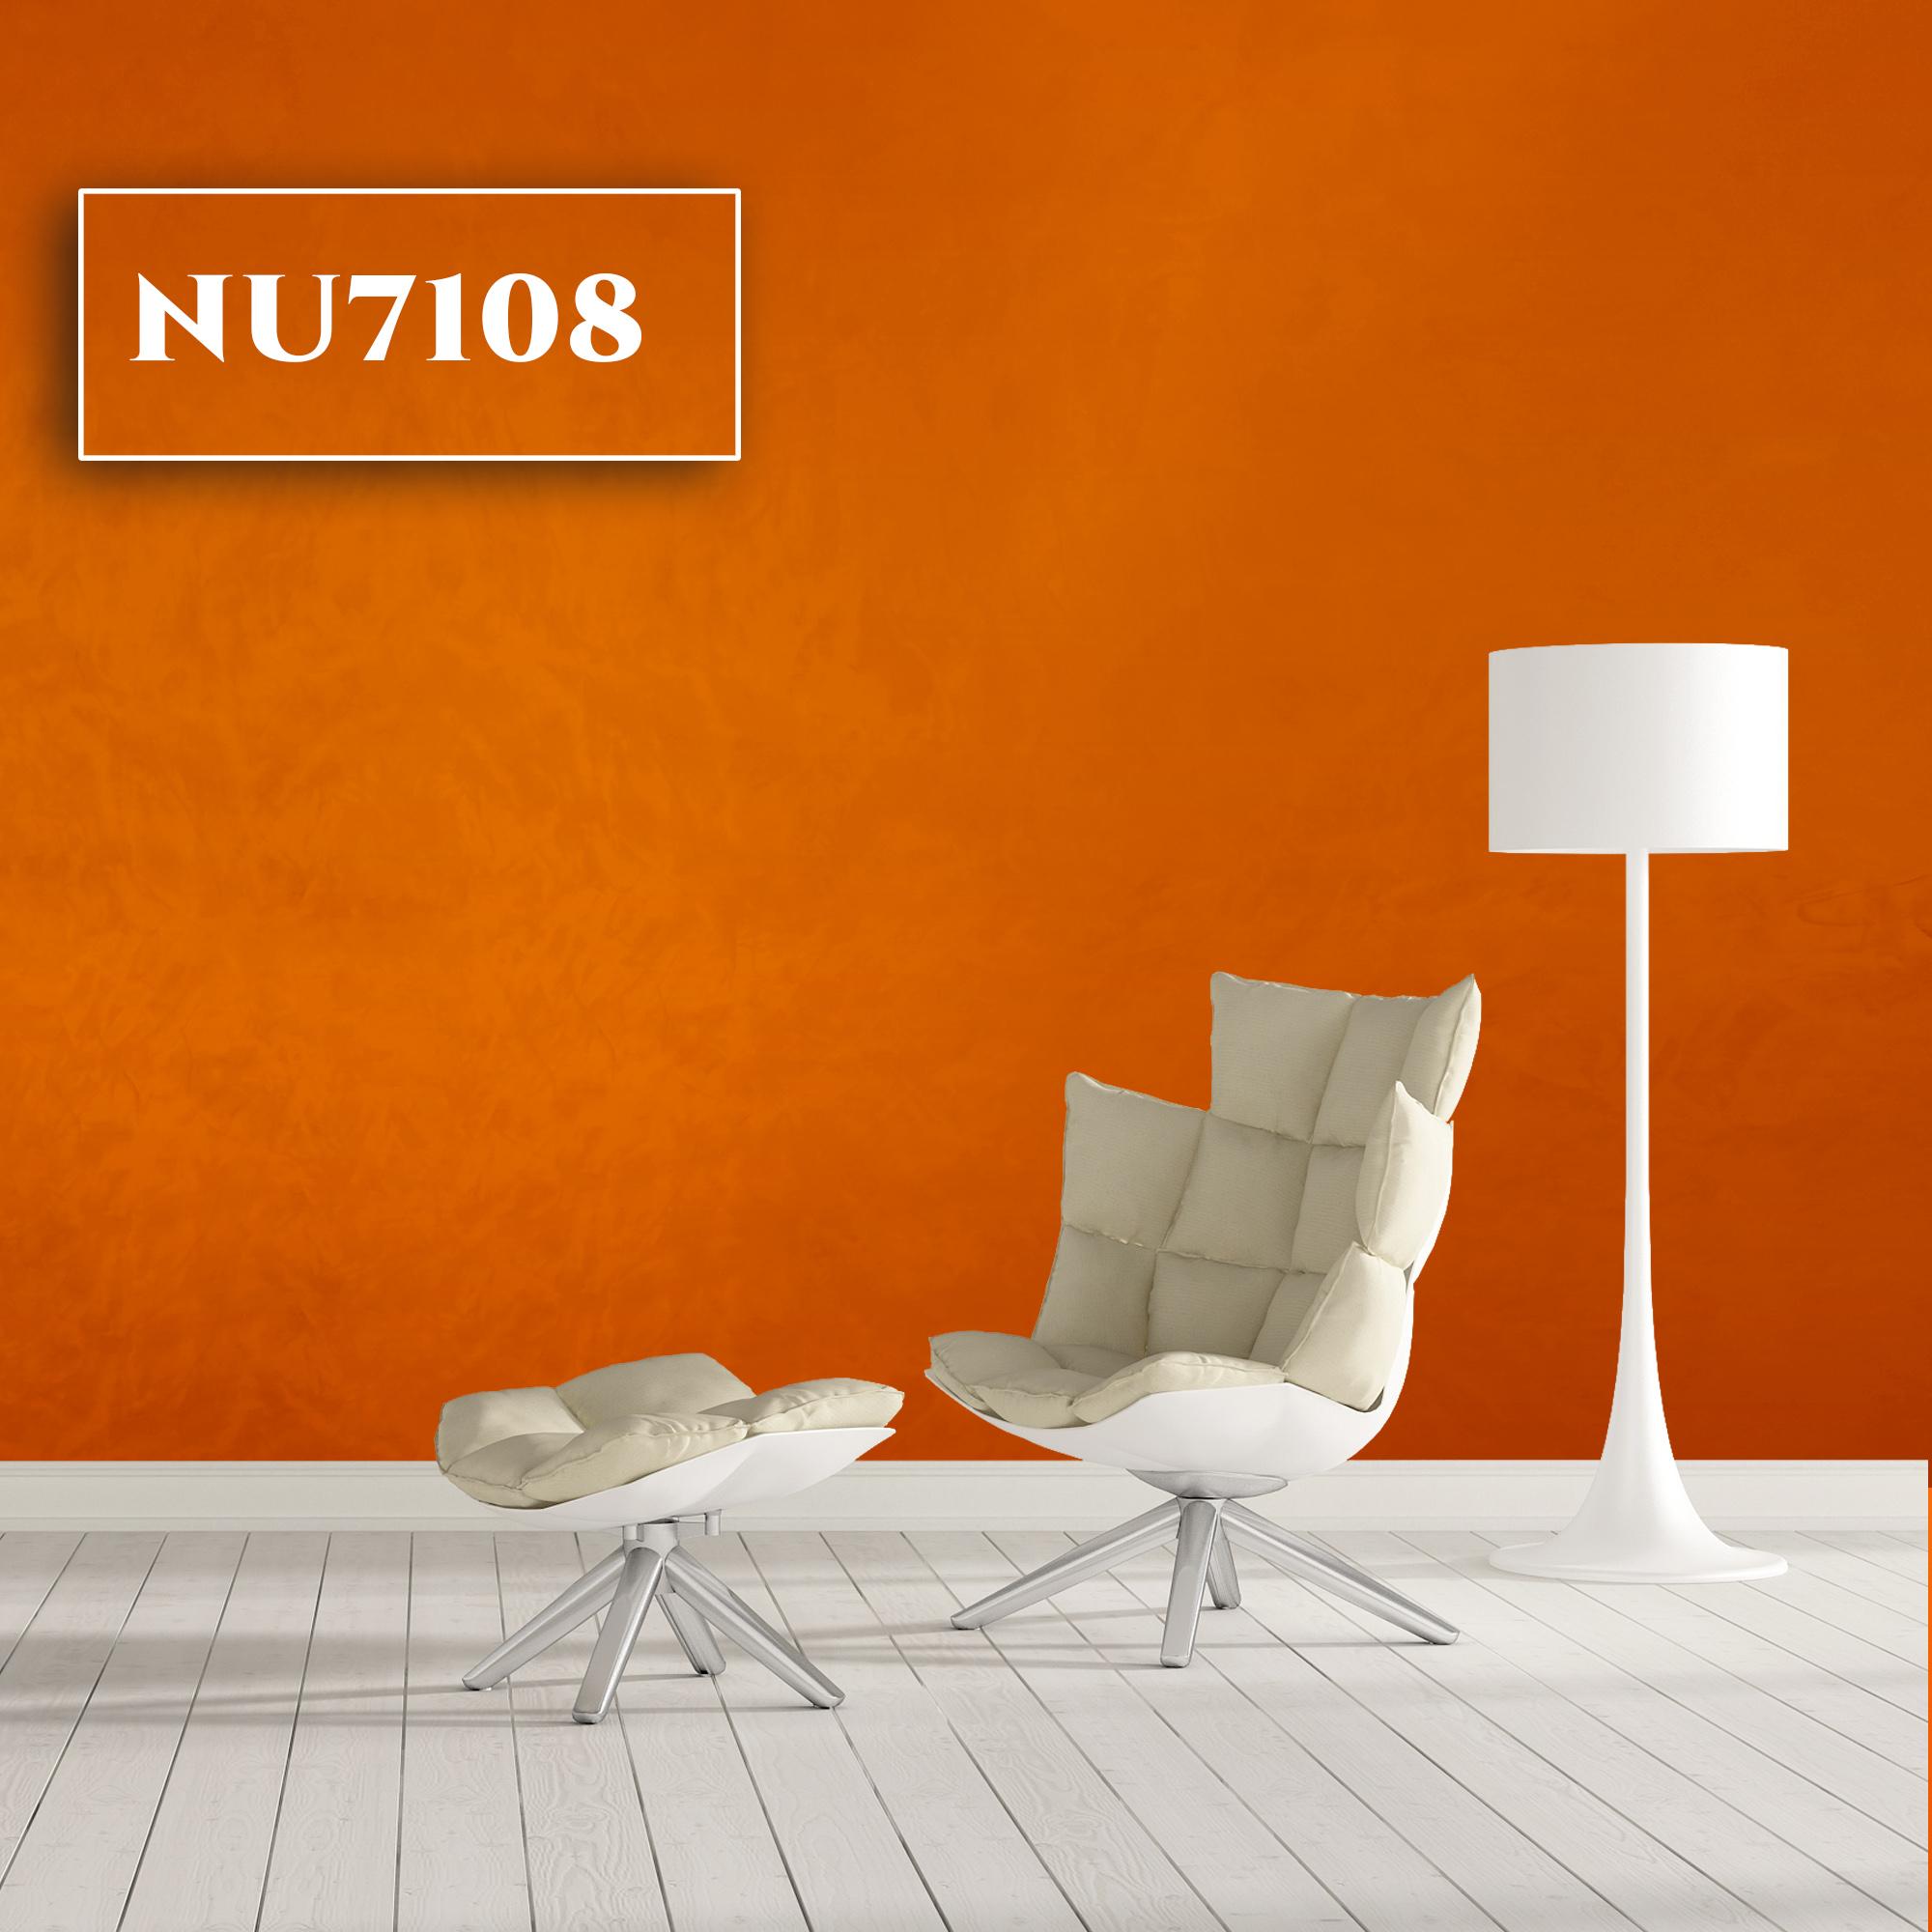 NU7108